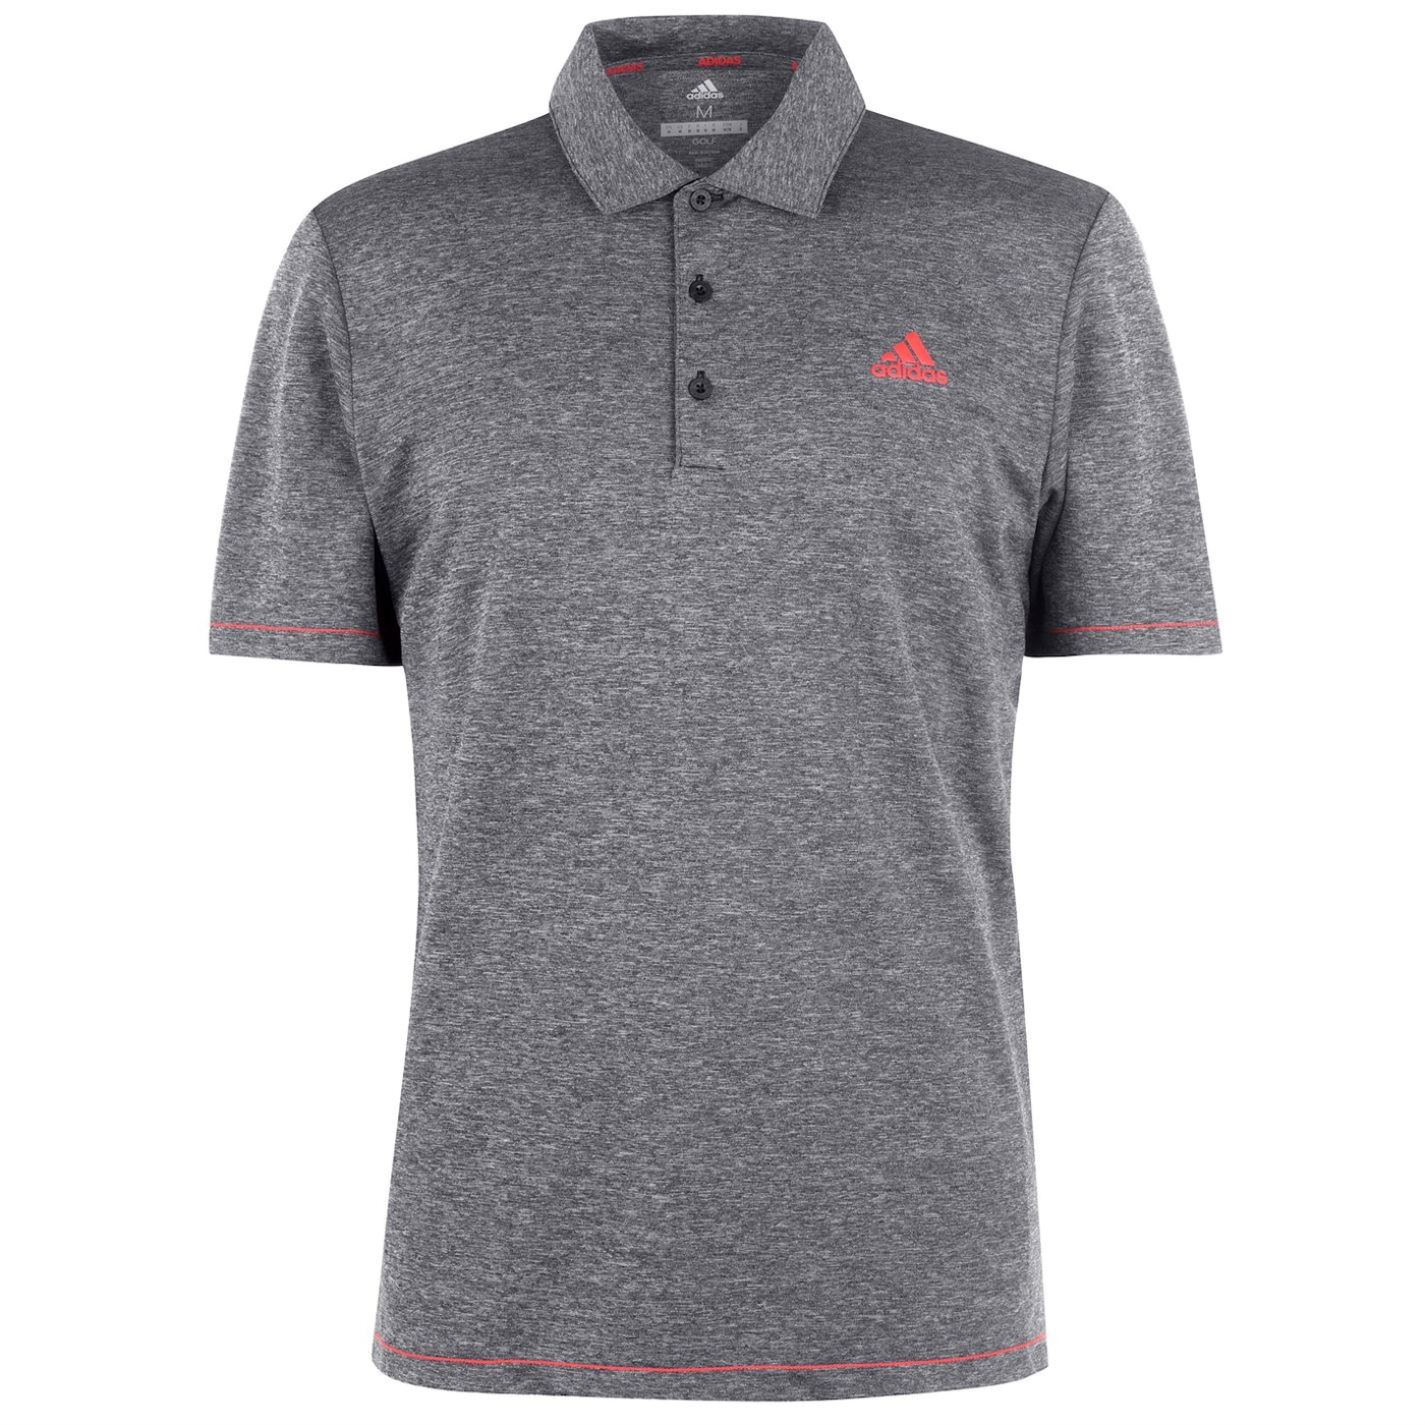 Adidas Advanced Golf Polo Shirt Mens